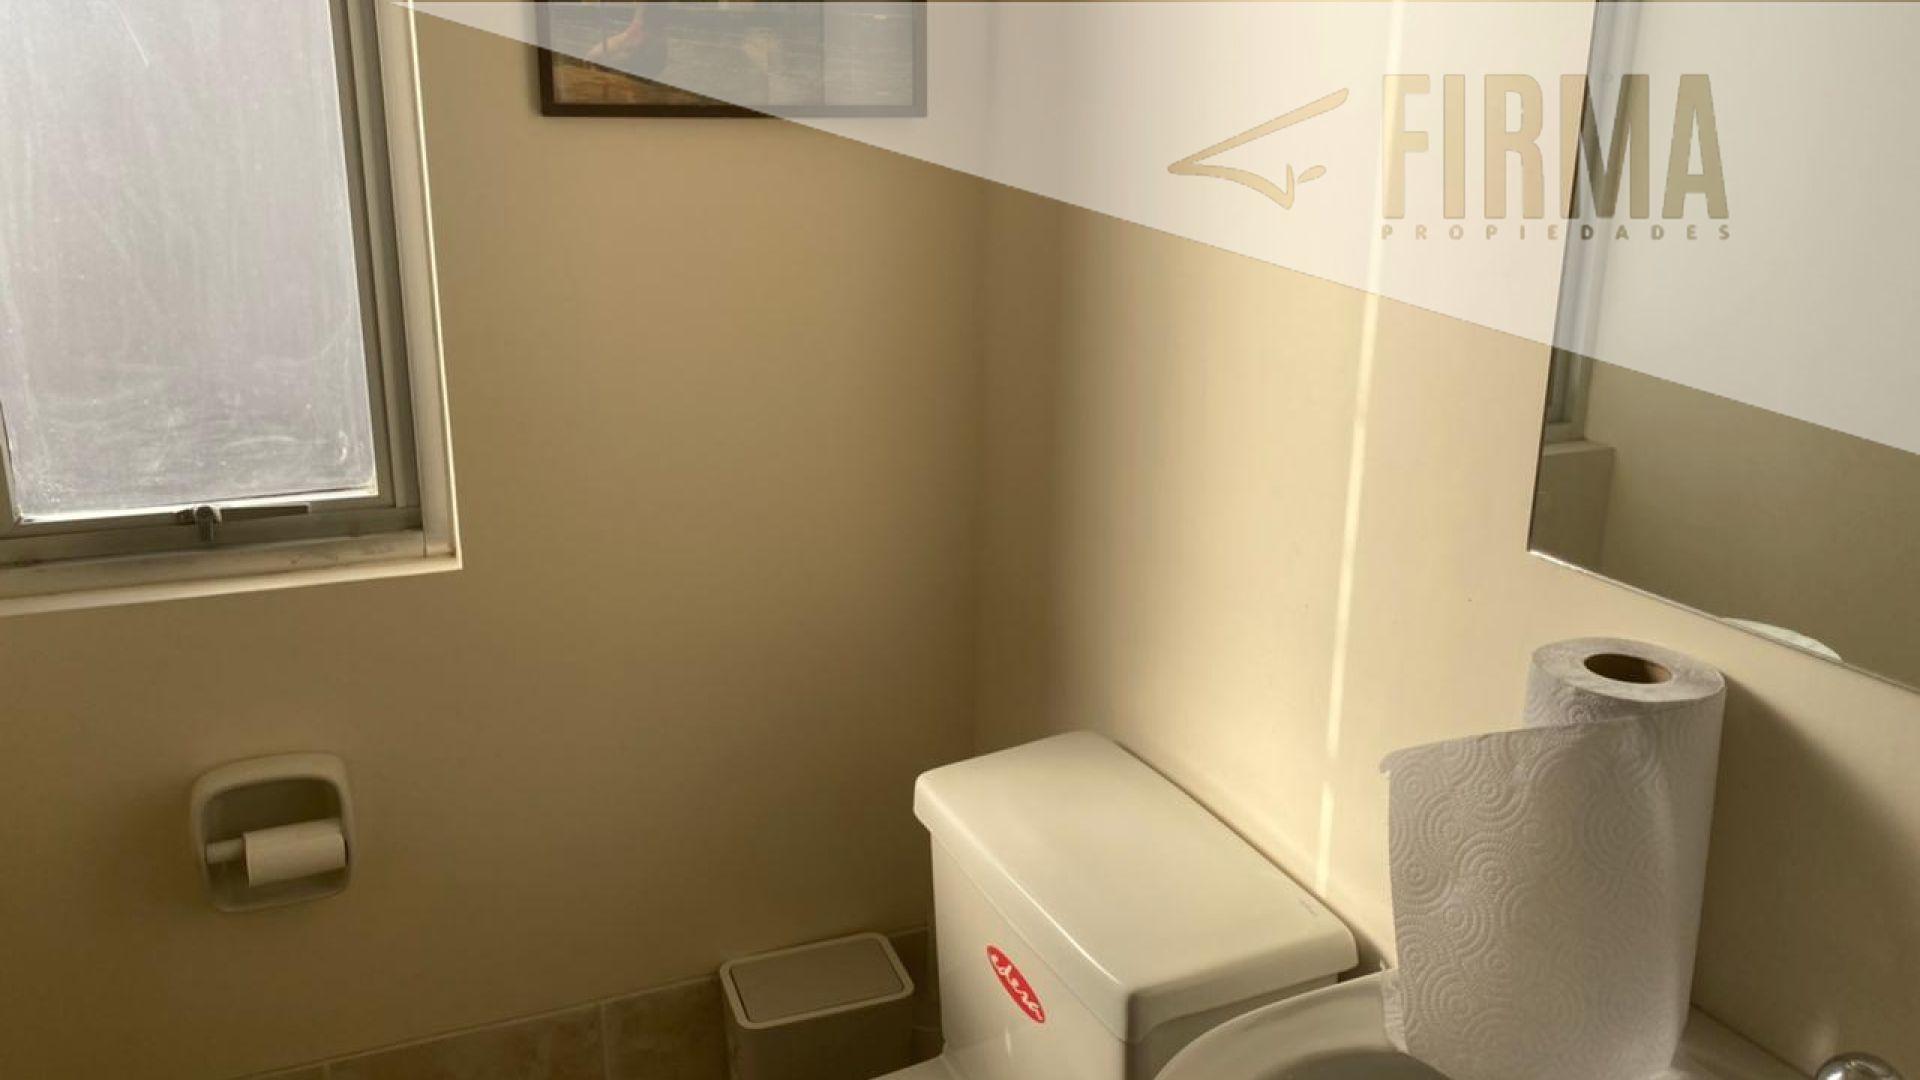 Oficina en Alquiler ALQUILA ESTA OFICINA EN CALACOTO Foto 6